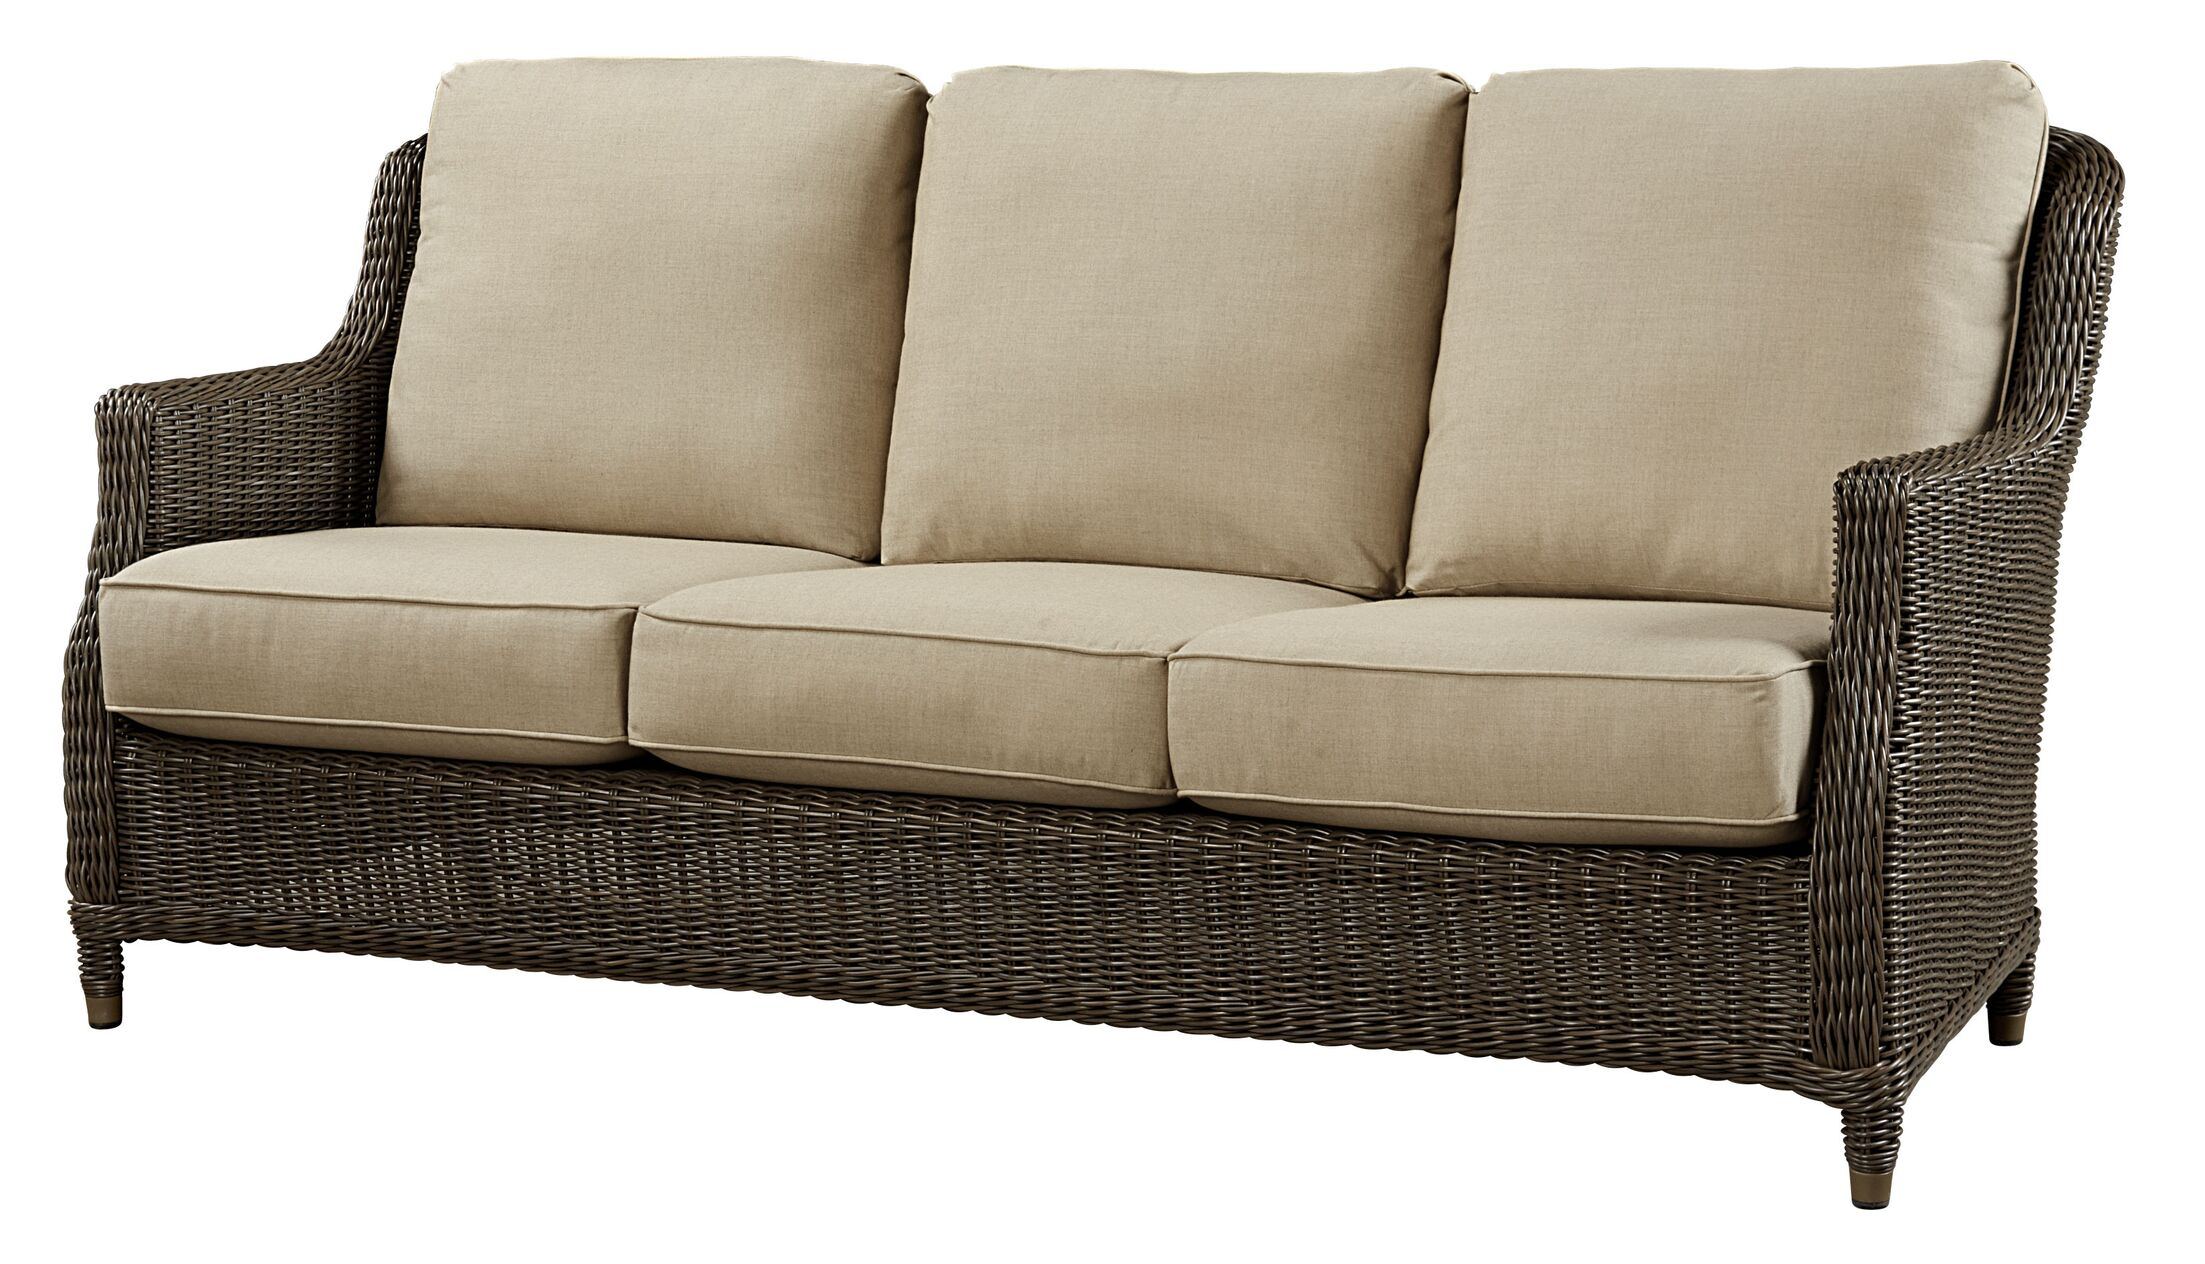 Sofa with Cushion Fabric: Java